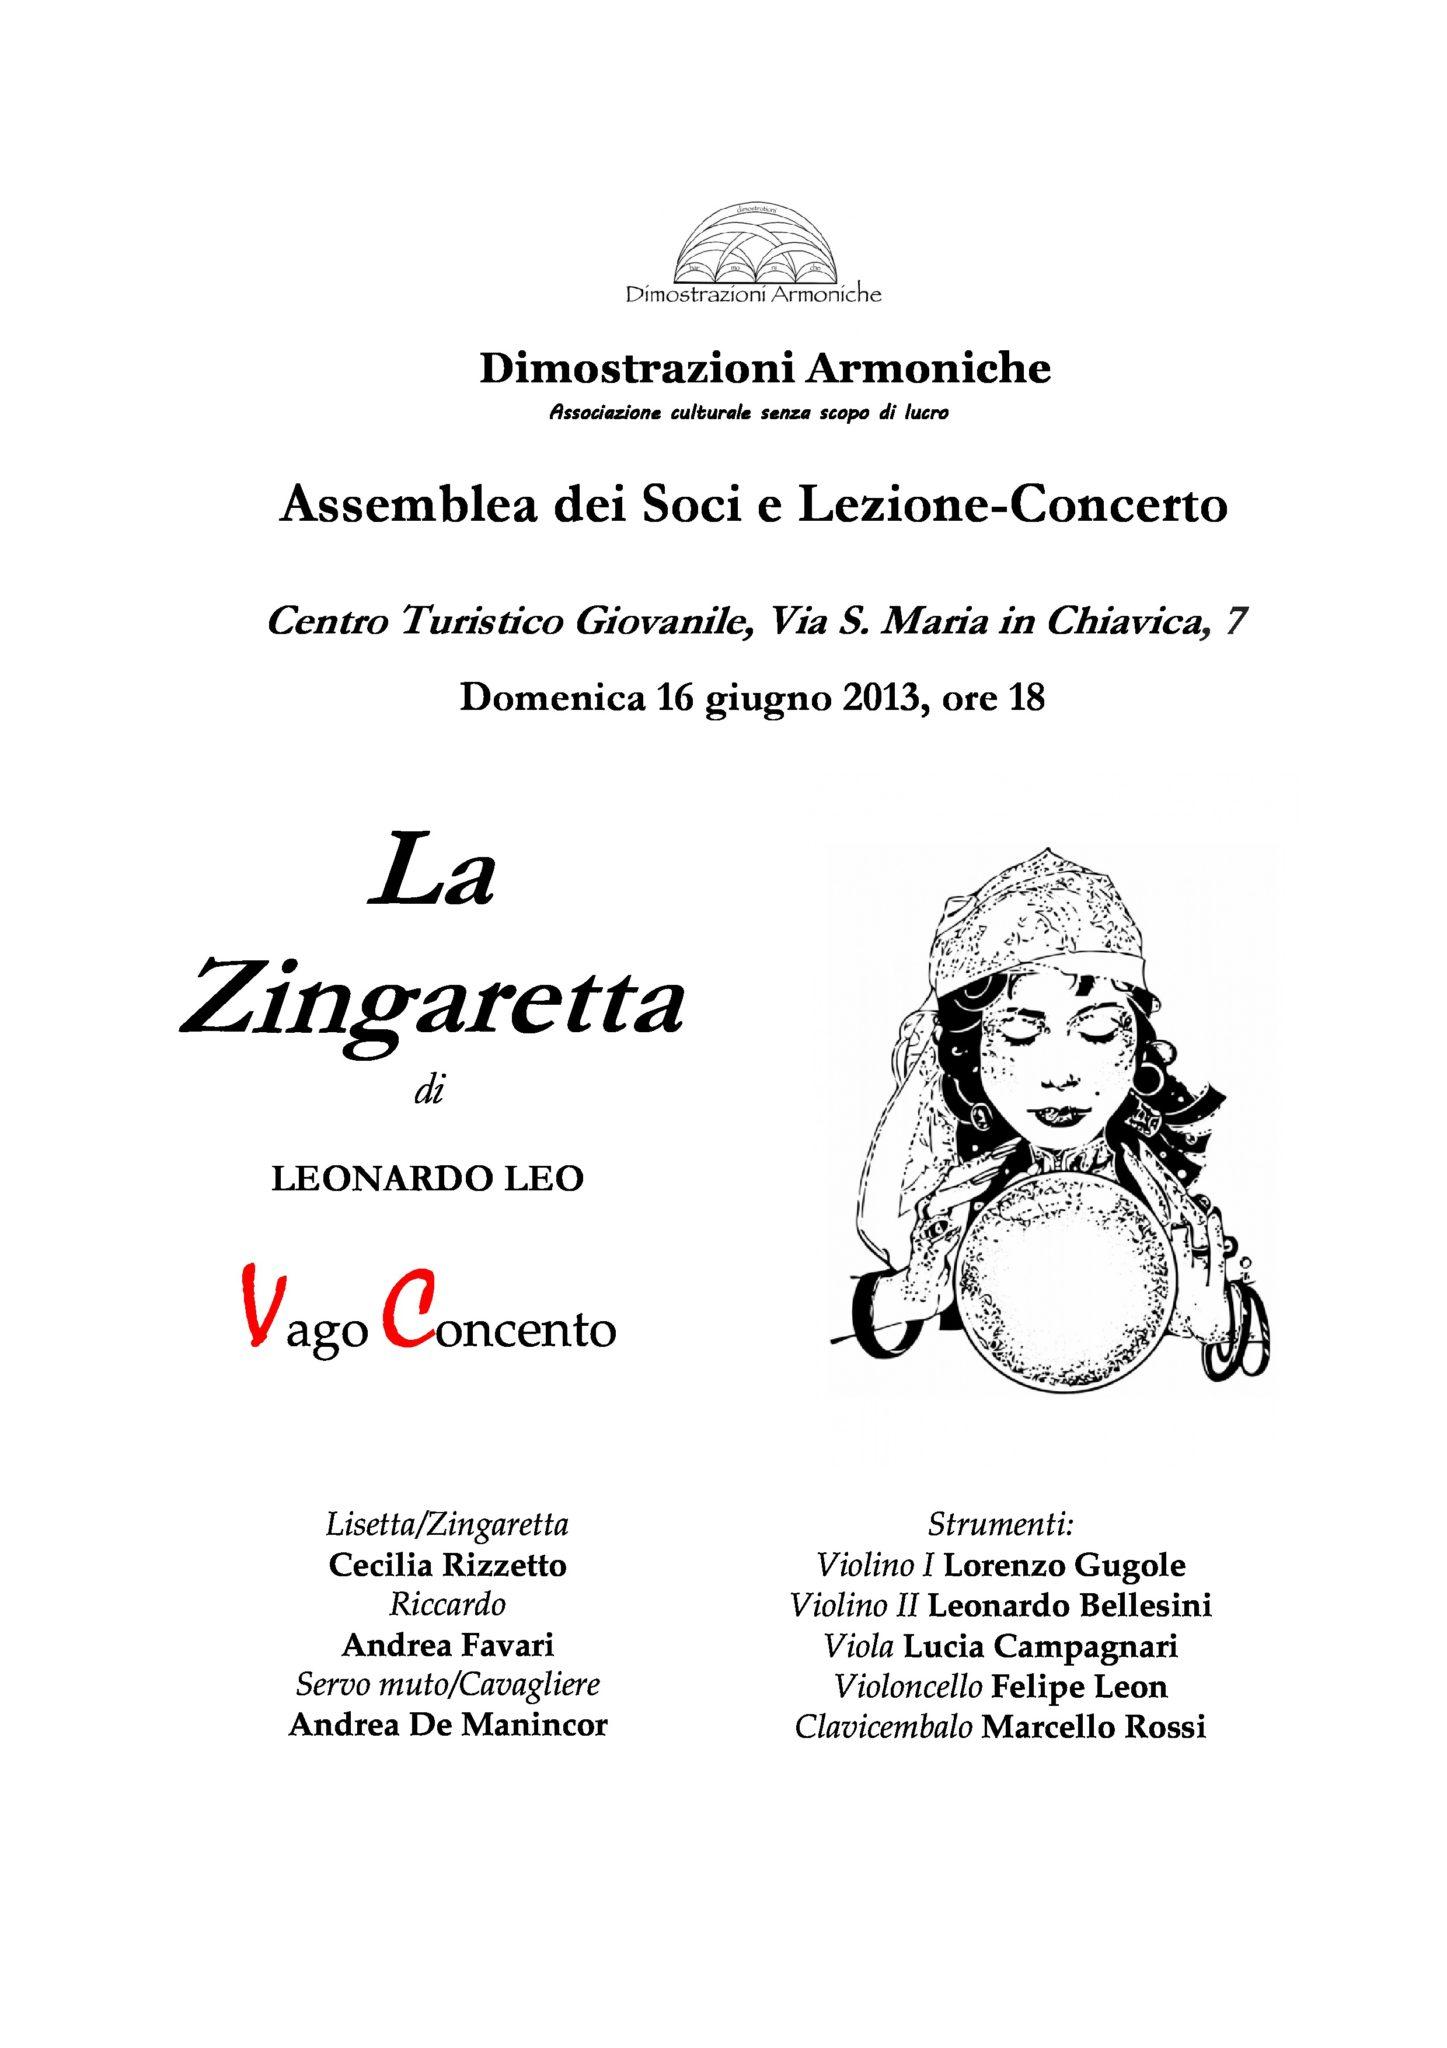 2013 locandina la zingaretta